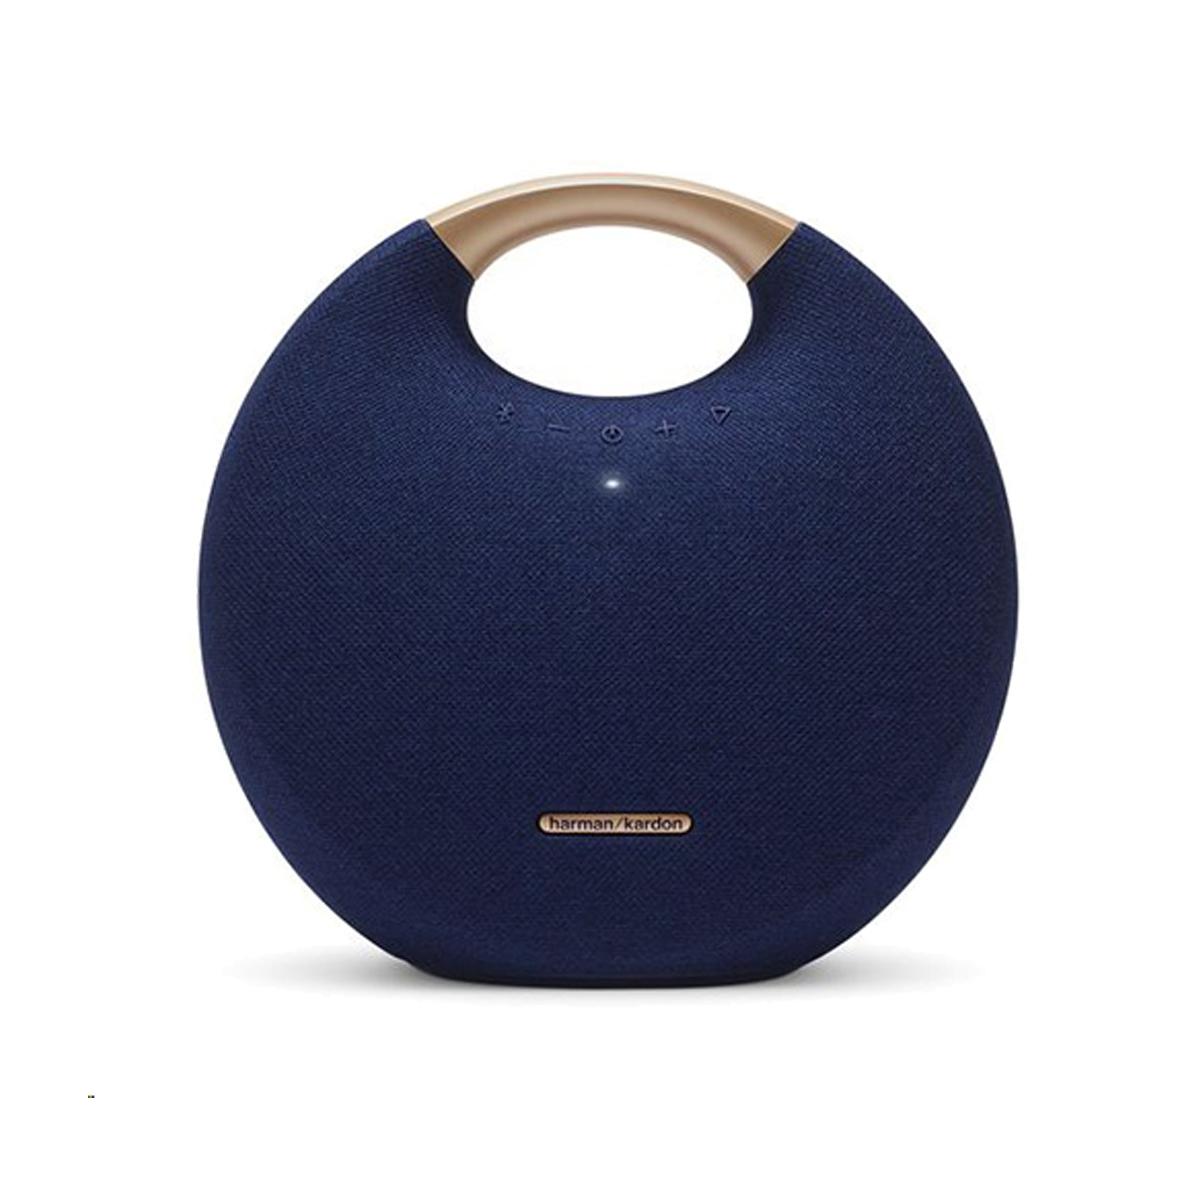 Onyx Studio 5 Wireless Bluetooth Speaker Blue -Parallel Import